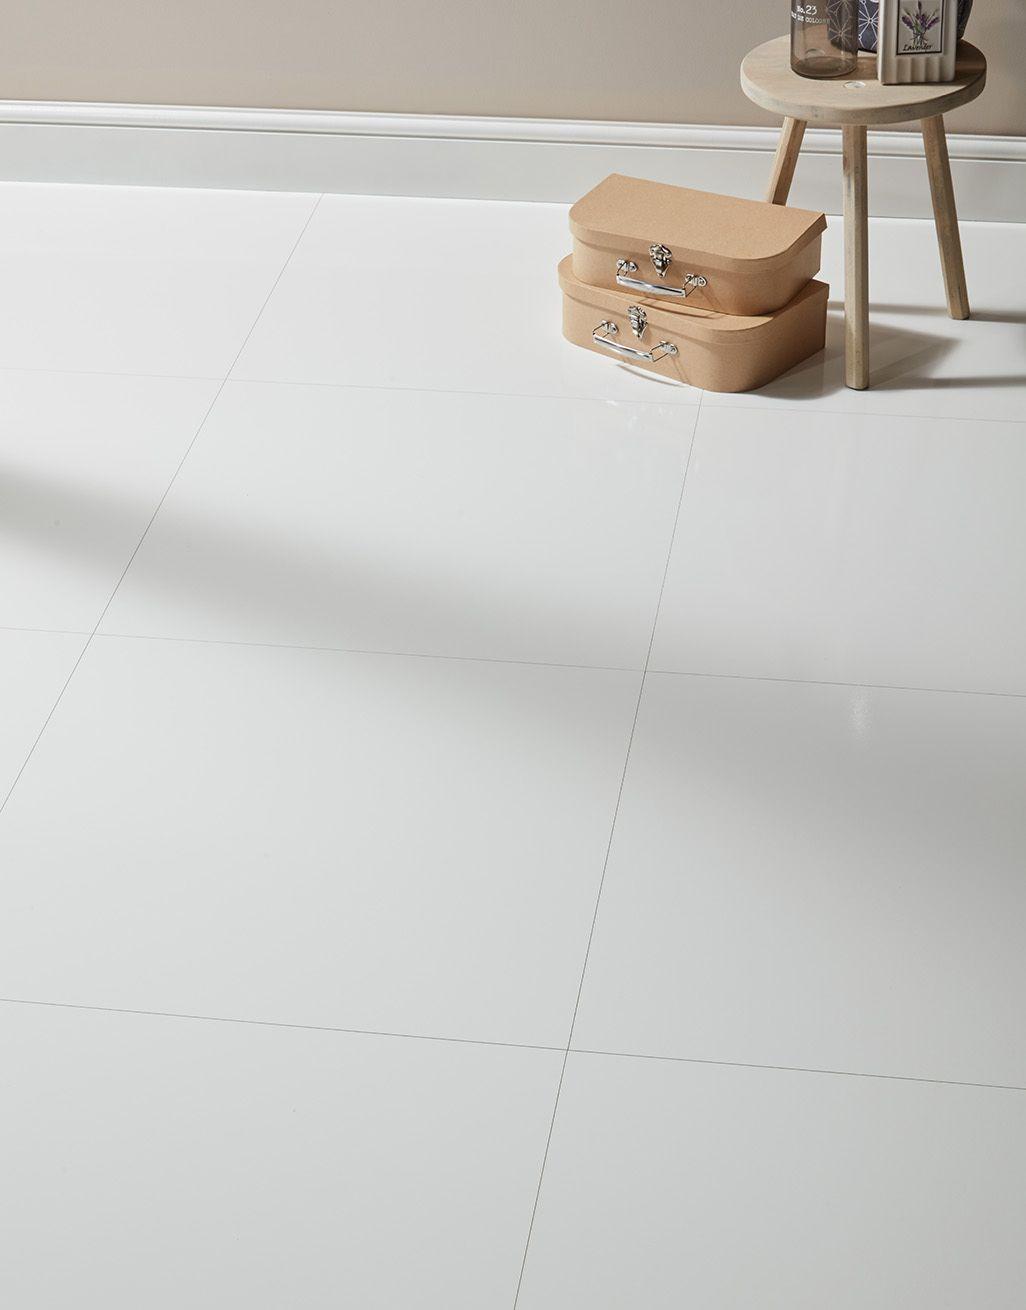 White High Gloss Laminate Flooring, Super Gloss White Laminate Flooring